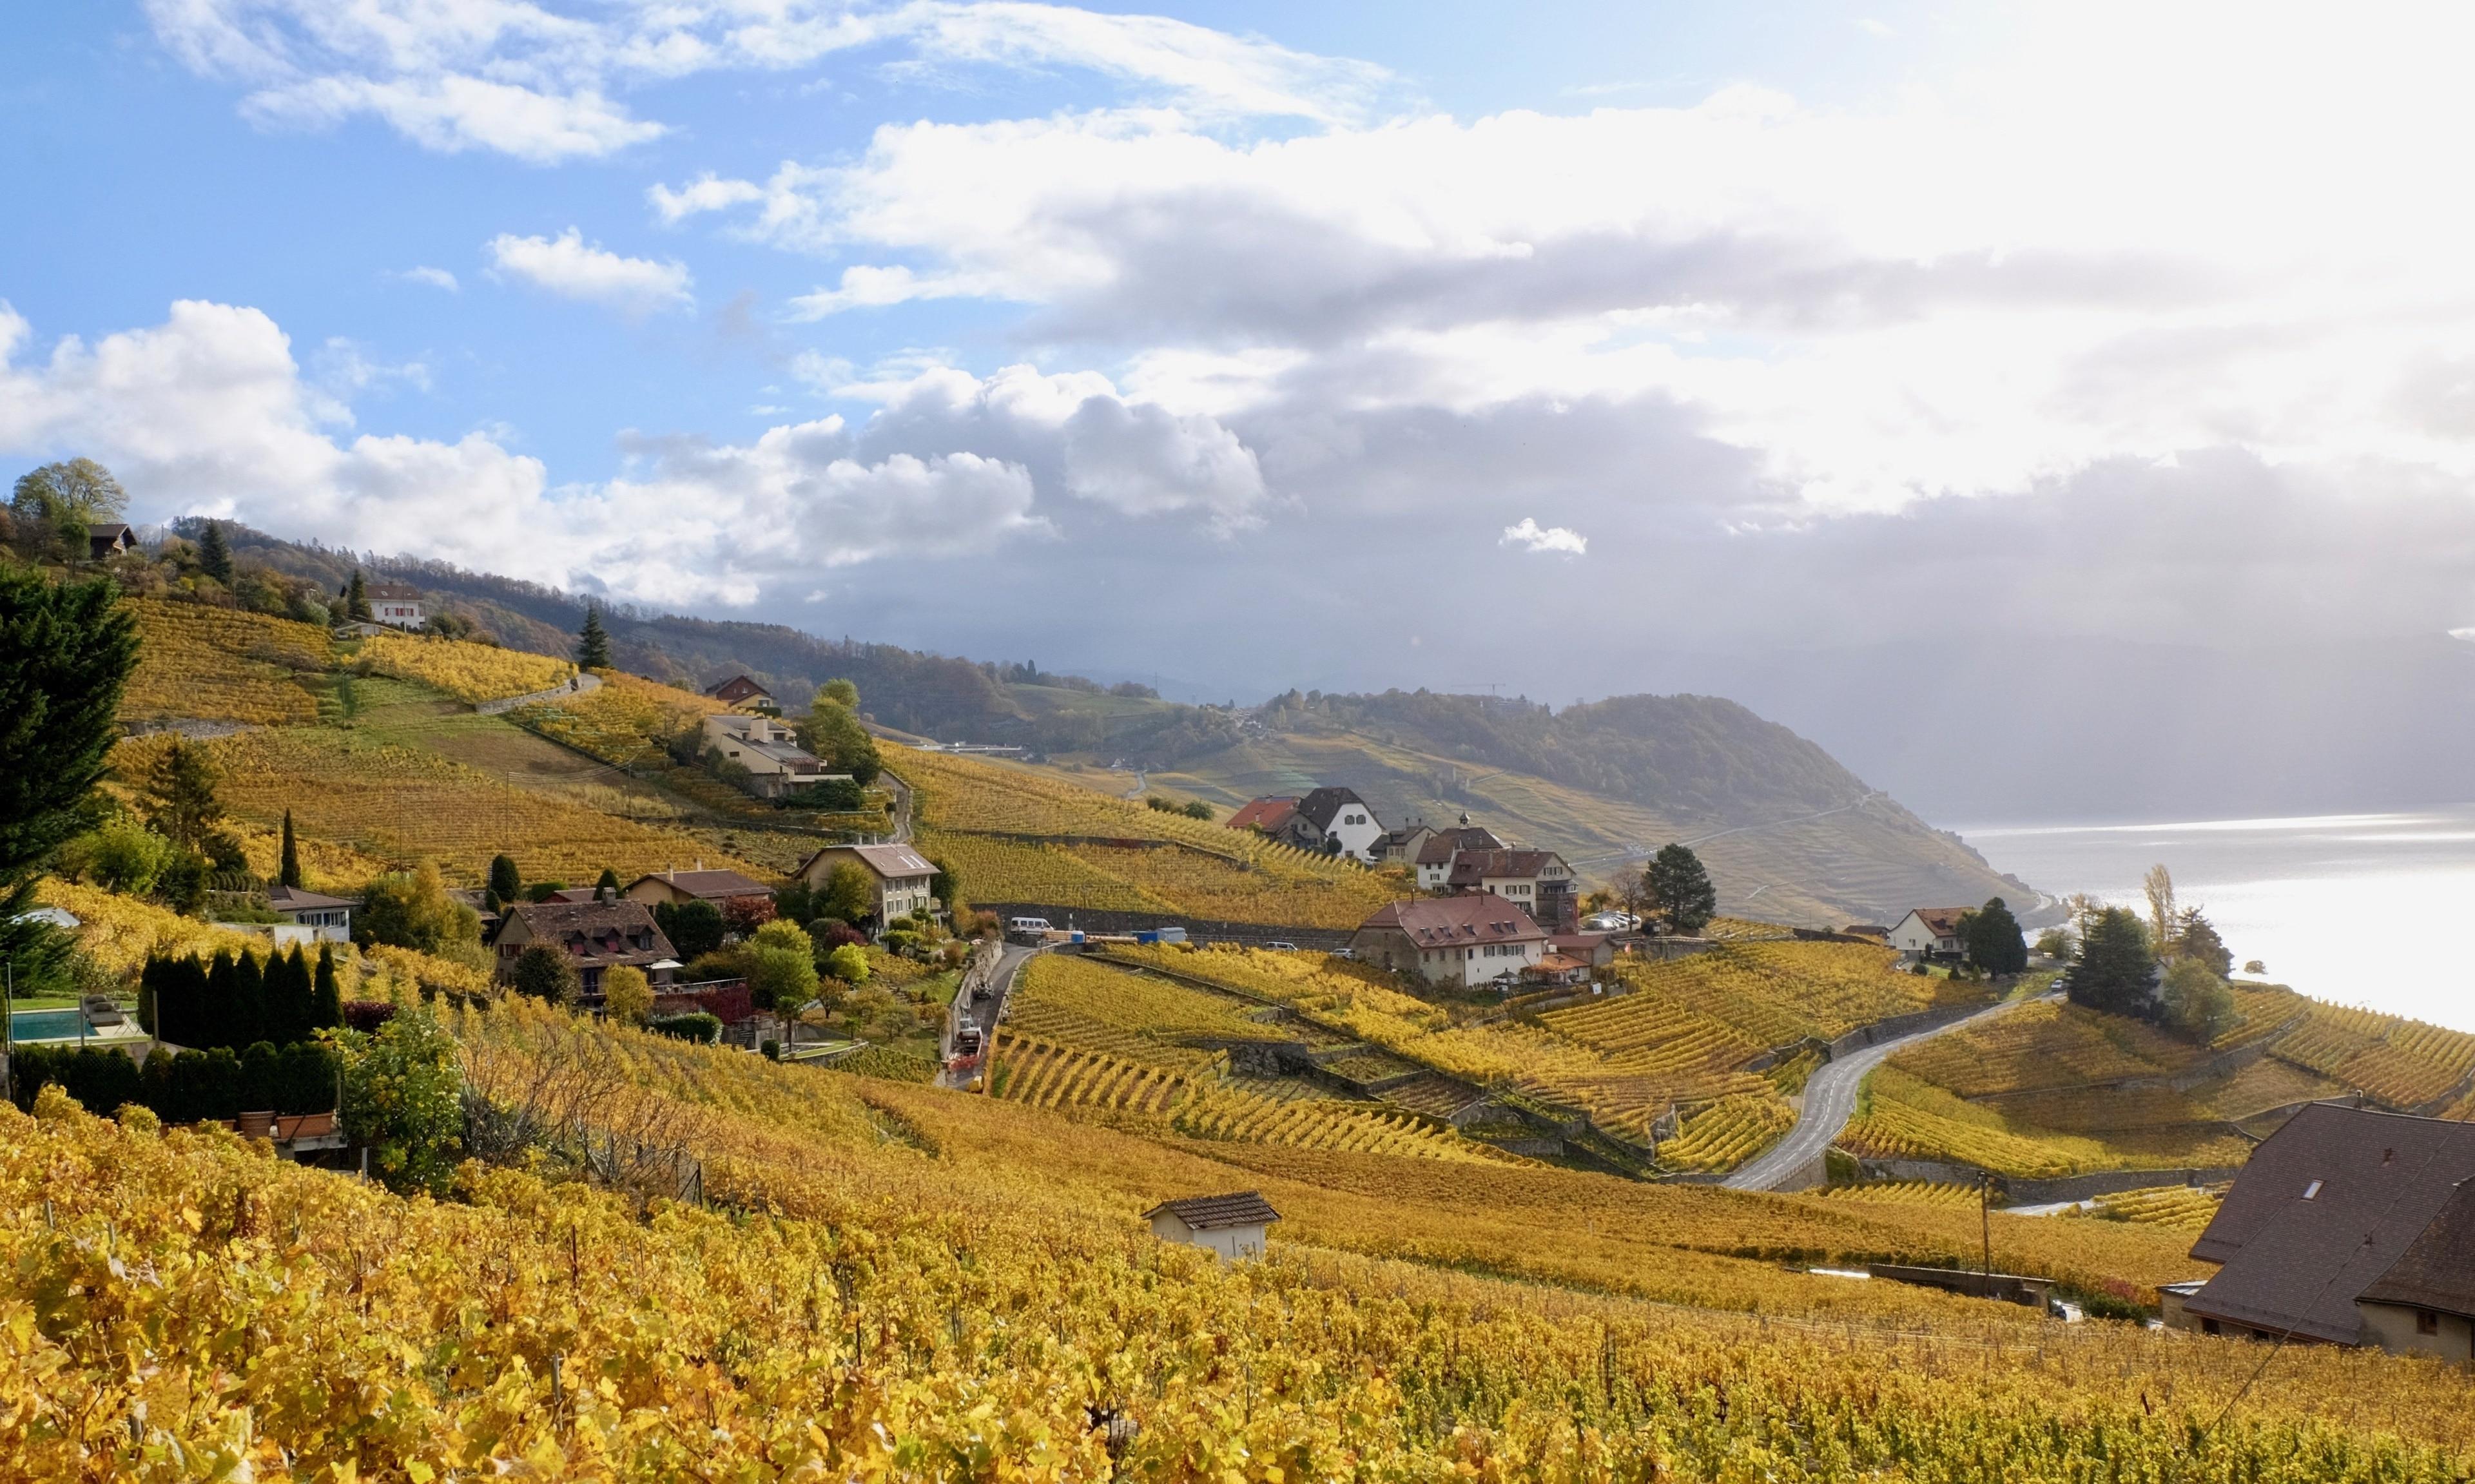 Lavaux-Oron District, Canton of Vaud, Switzerland